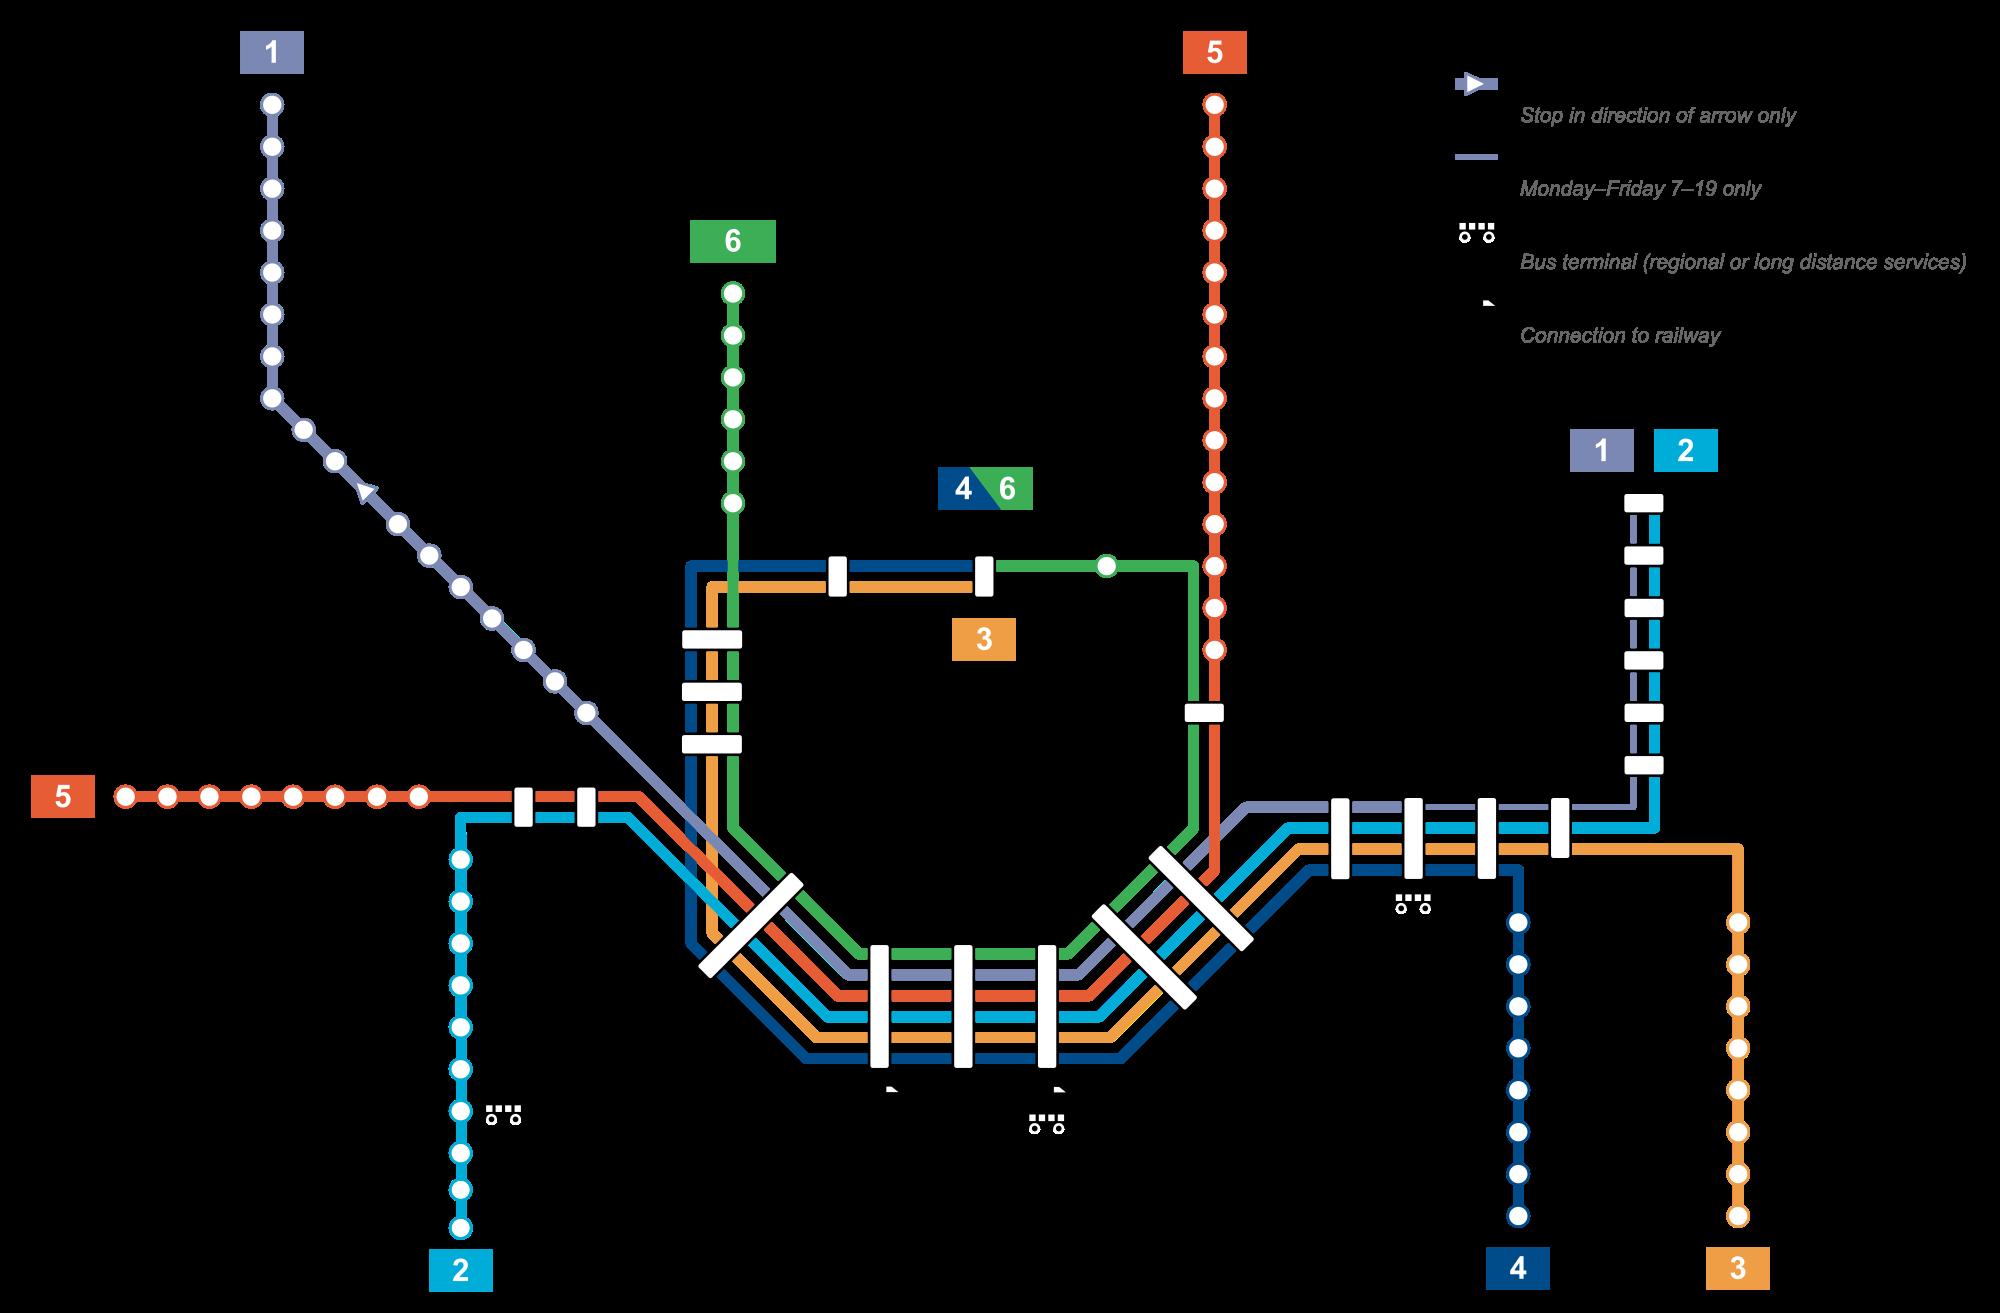 oslo_t-bane_linjekart_svg.png